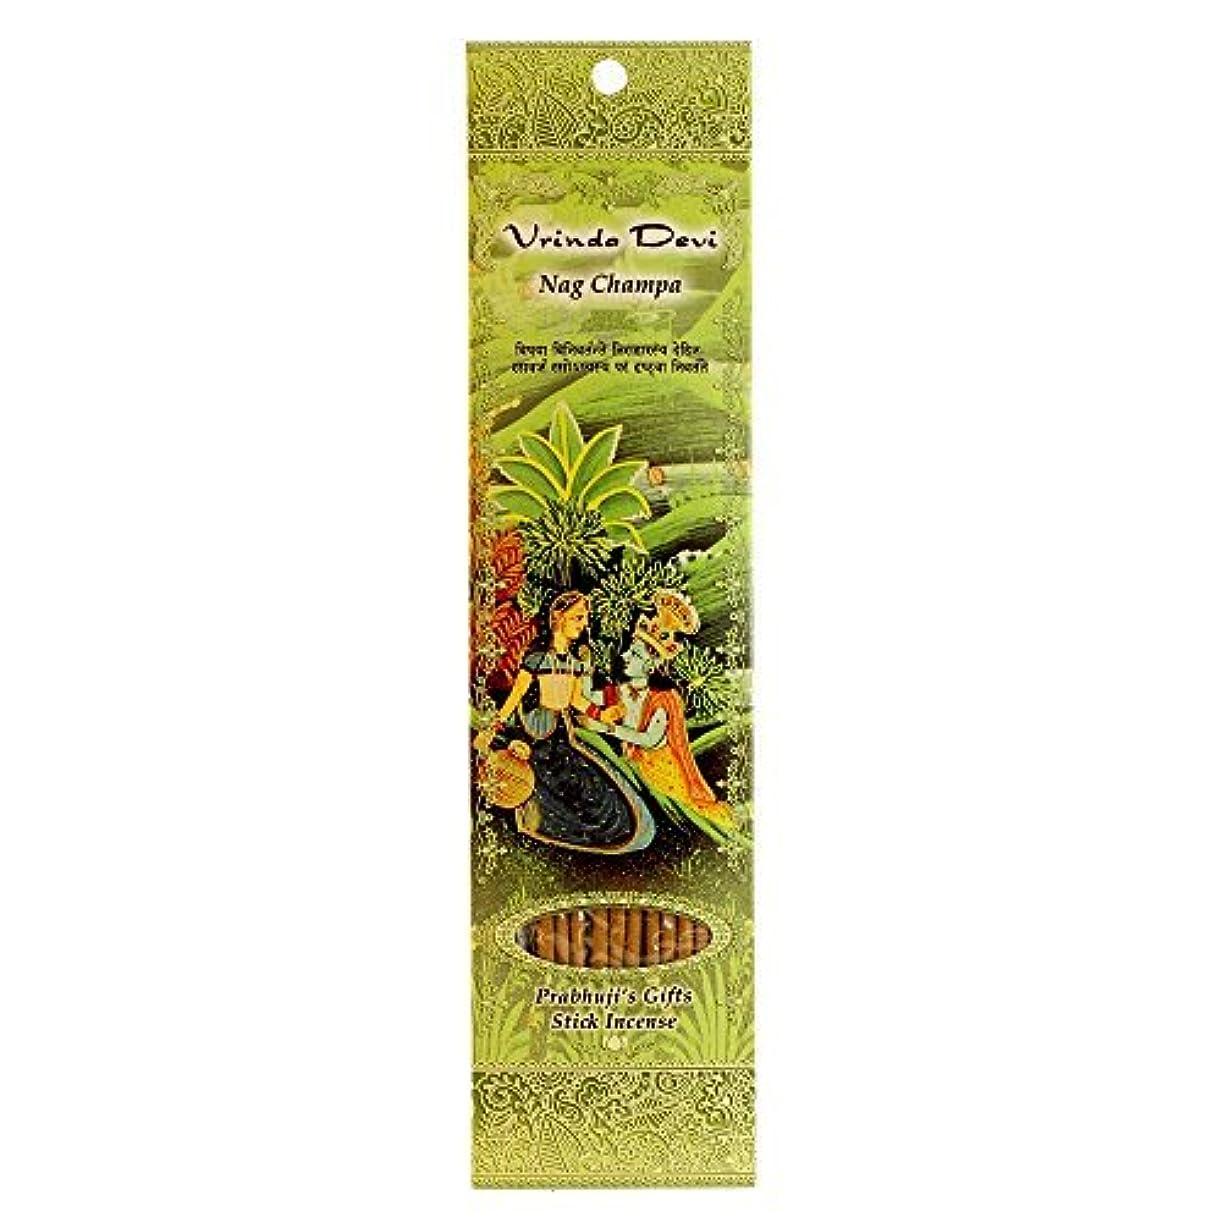 入植者調和囚人Incense Sticks Vrinda Devi - Nag Champa [並行輸入品]